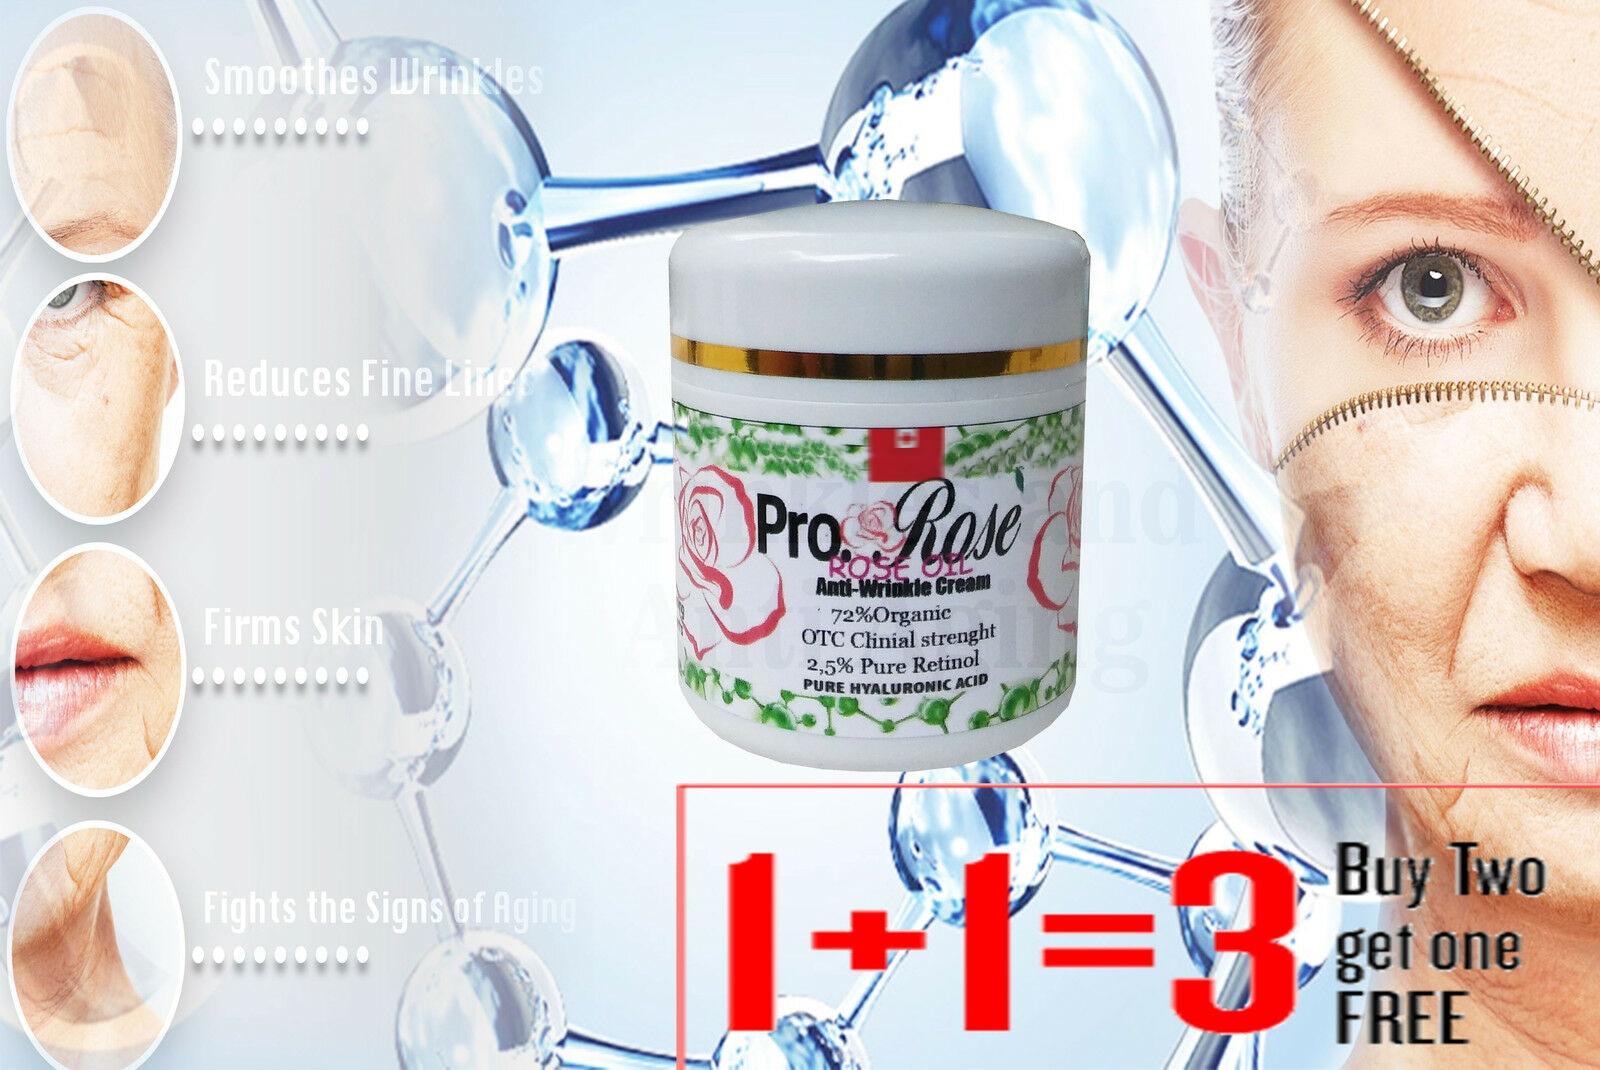 anti rugas retinol creme matrixyl rose oil secrecao do caracol acido hialuronico